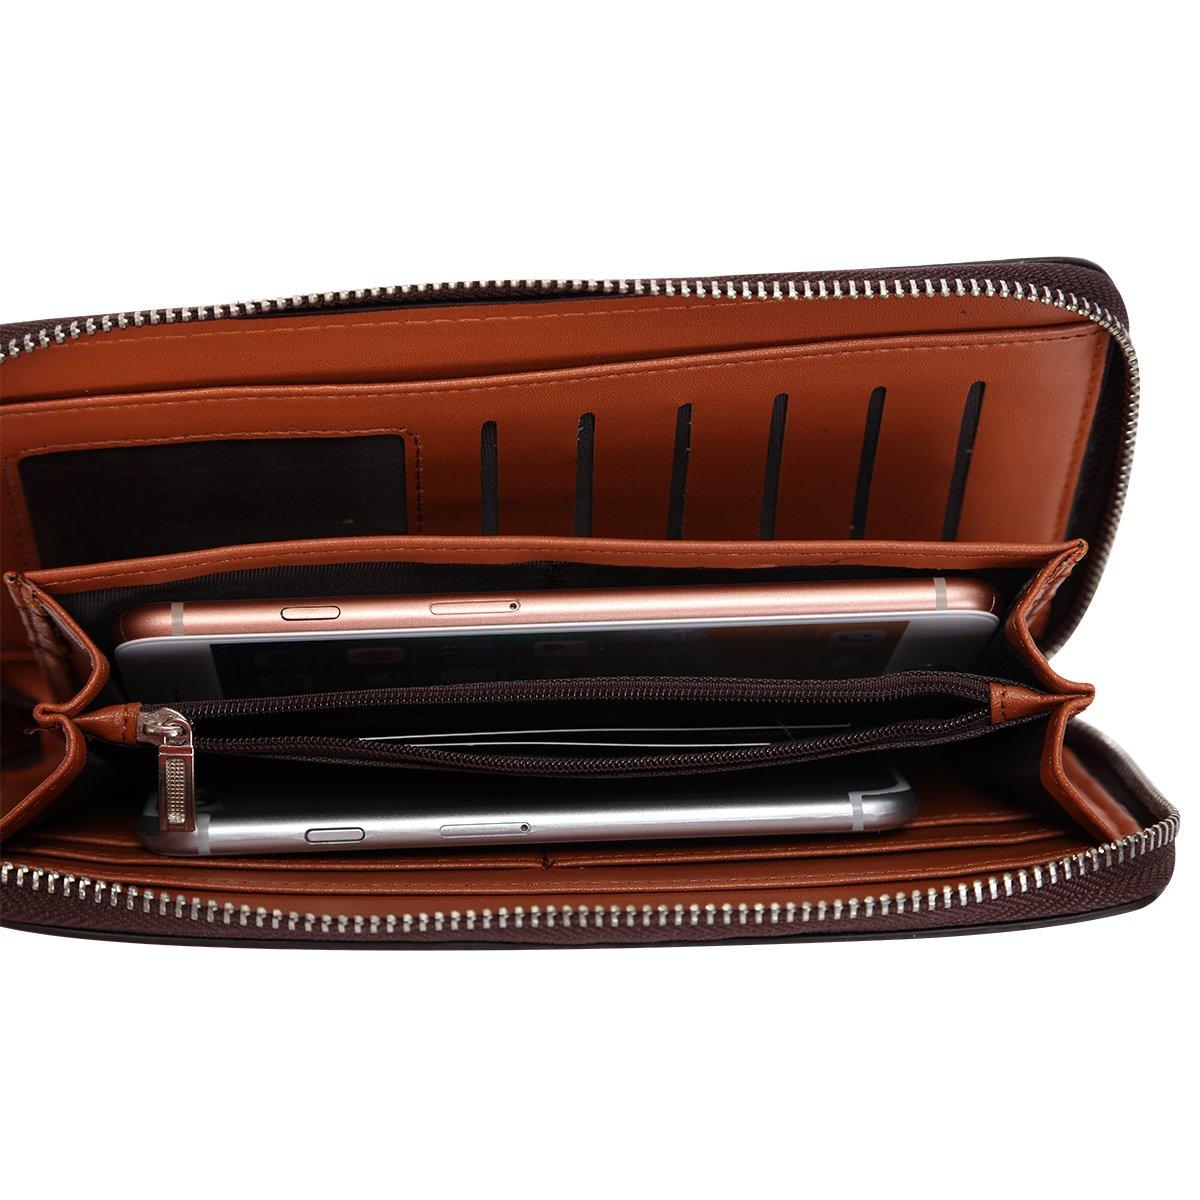 Mens Clutch Genuine Leather Handbag Organizer Checkbook Wallet Card Case by HOLYBIRD (Image #4)